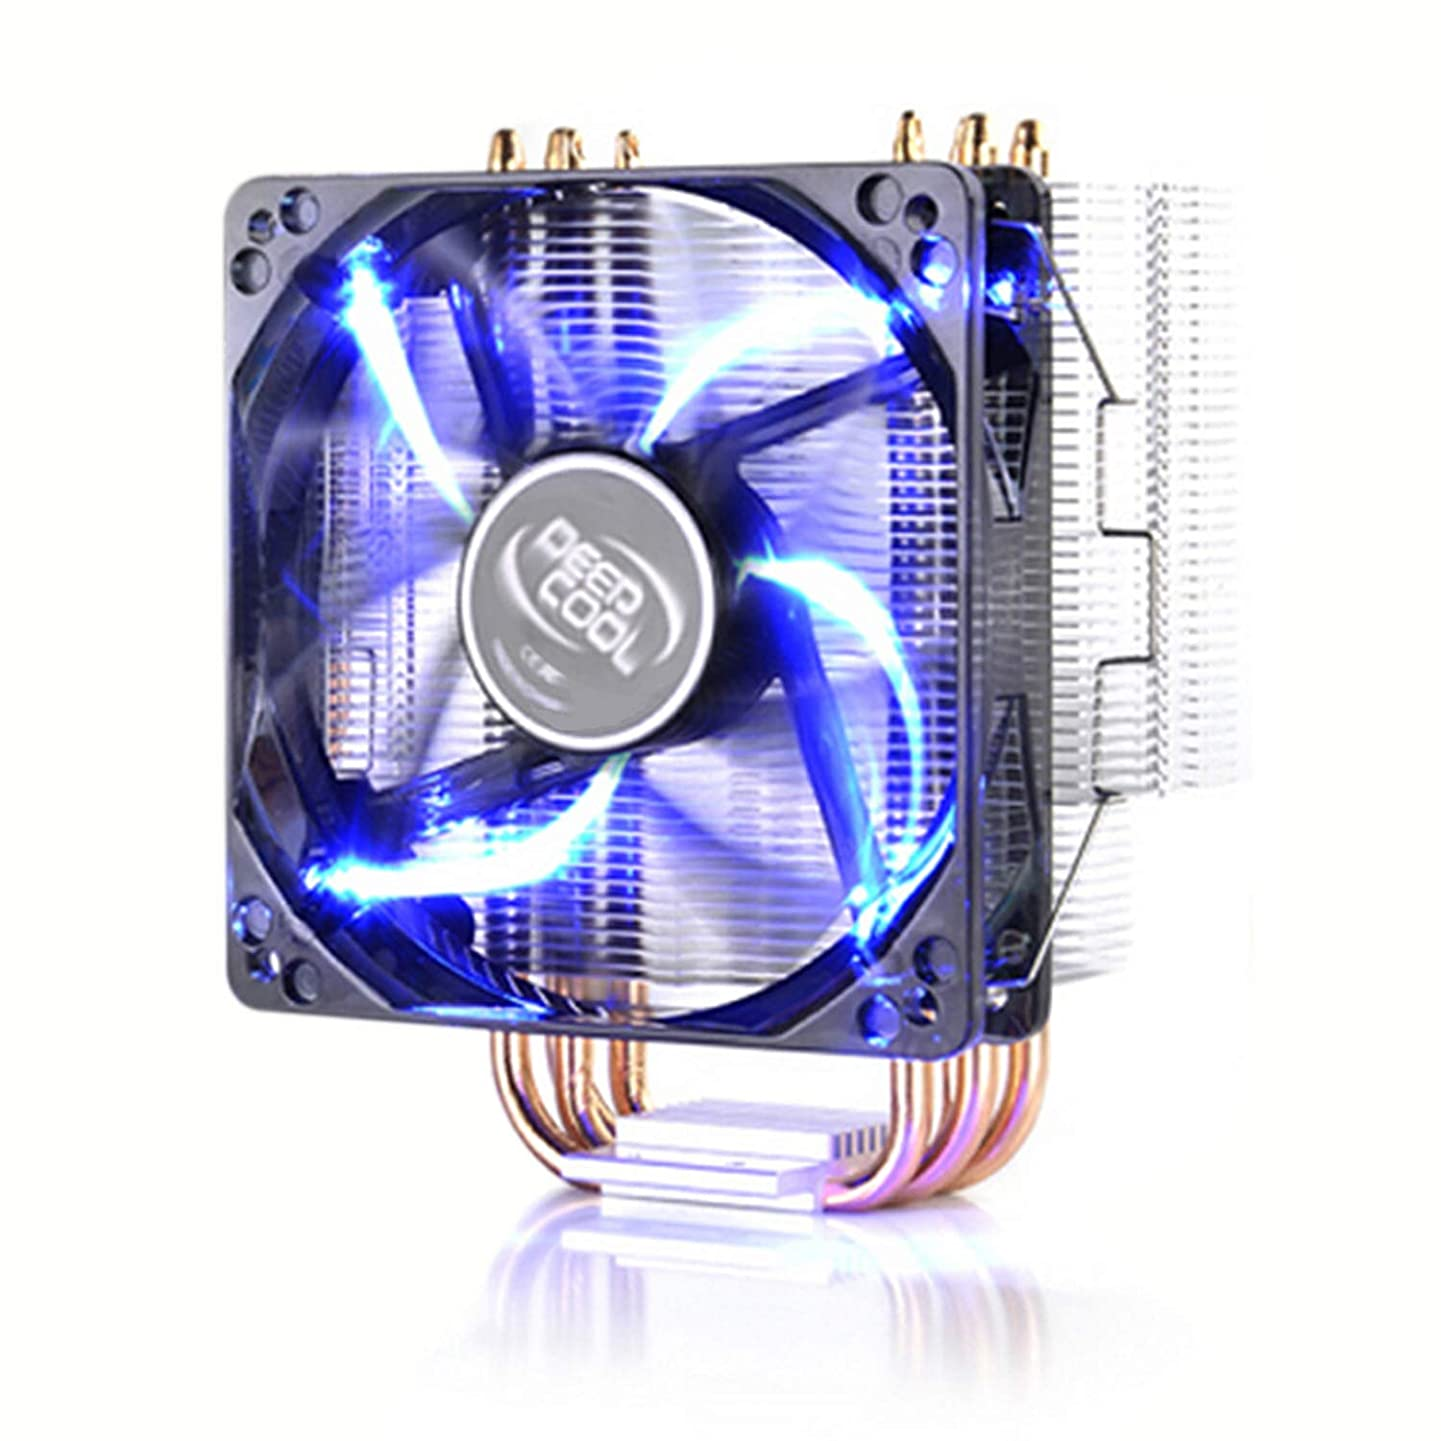 PC Computer CPU Aluminum Heatsink LED Fan Cooler CPU Air Cooler AMD 2/3 & Intel LGA 1156/775/1150/1155 Core i7/i5/i3